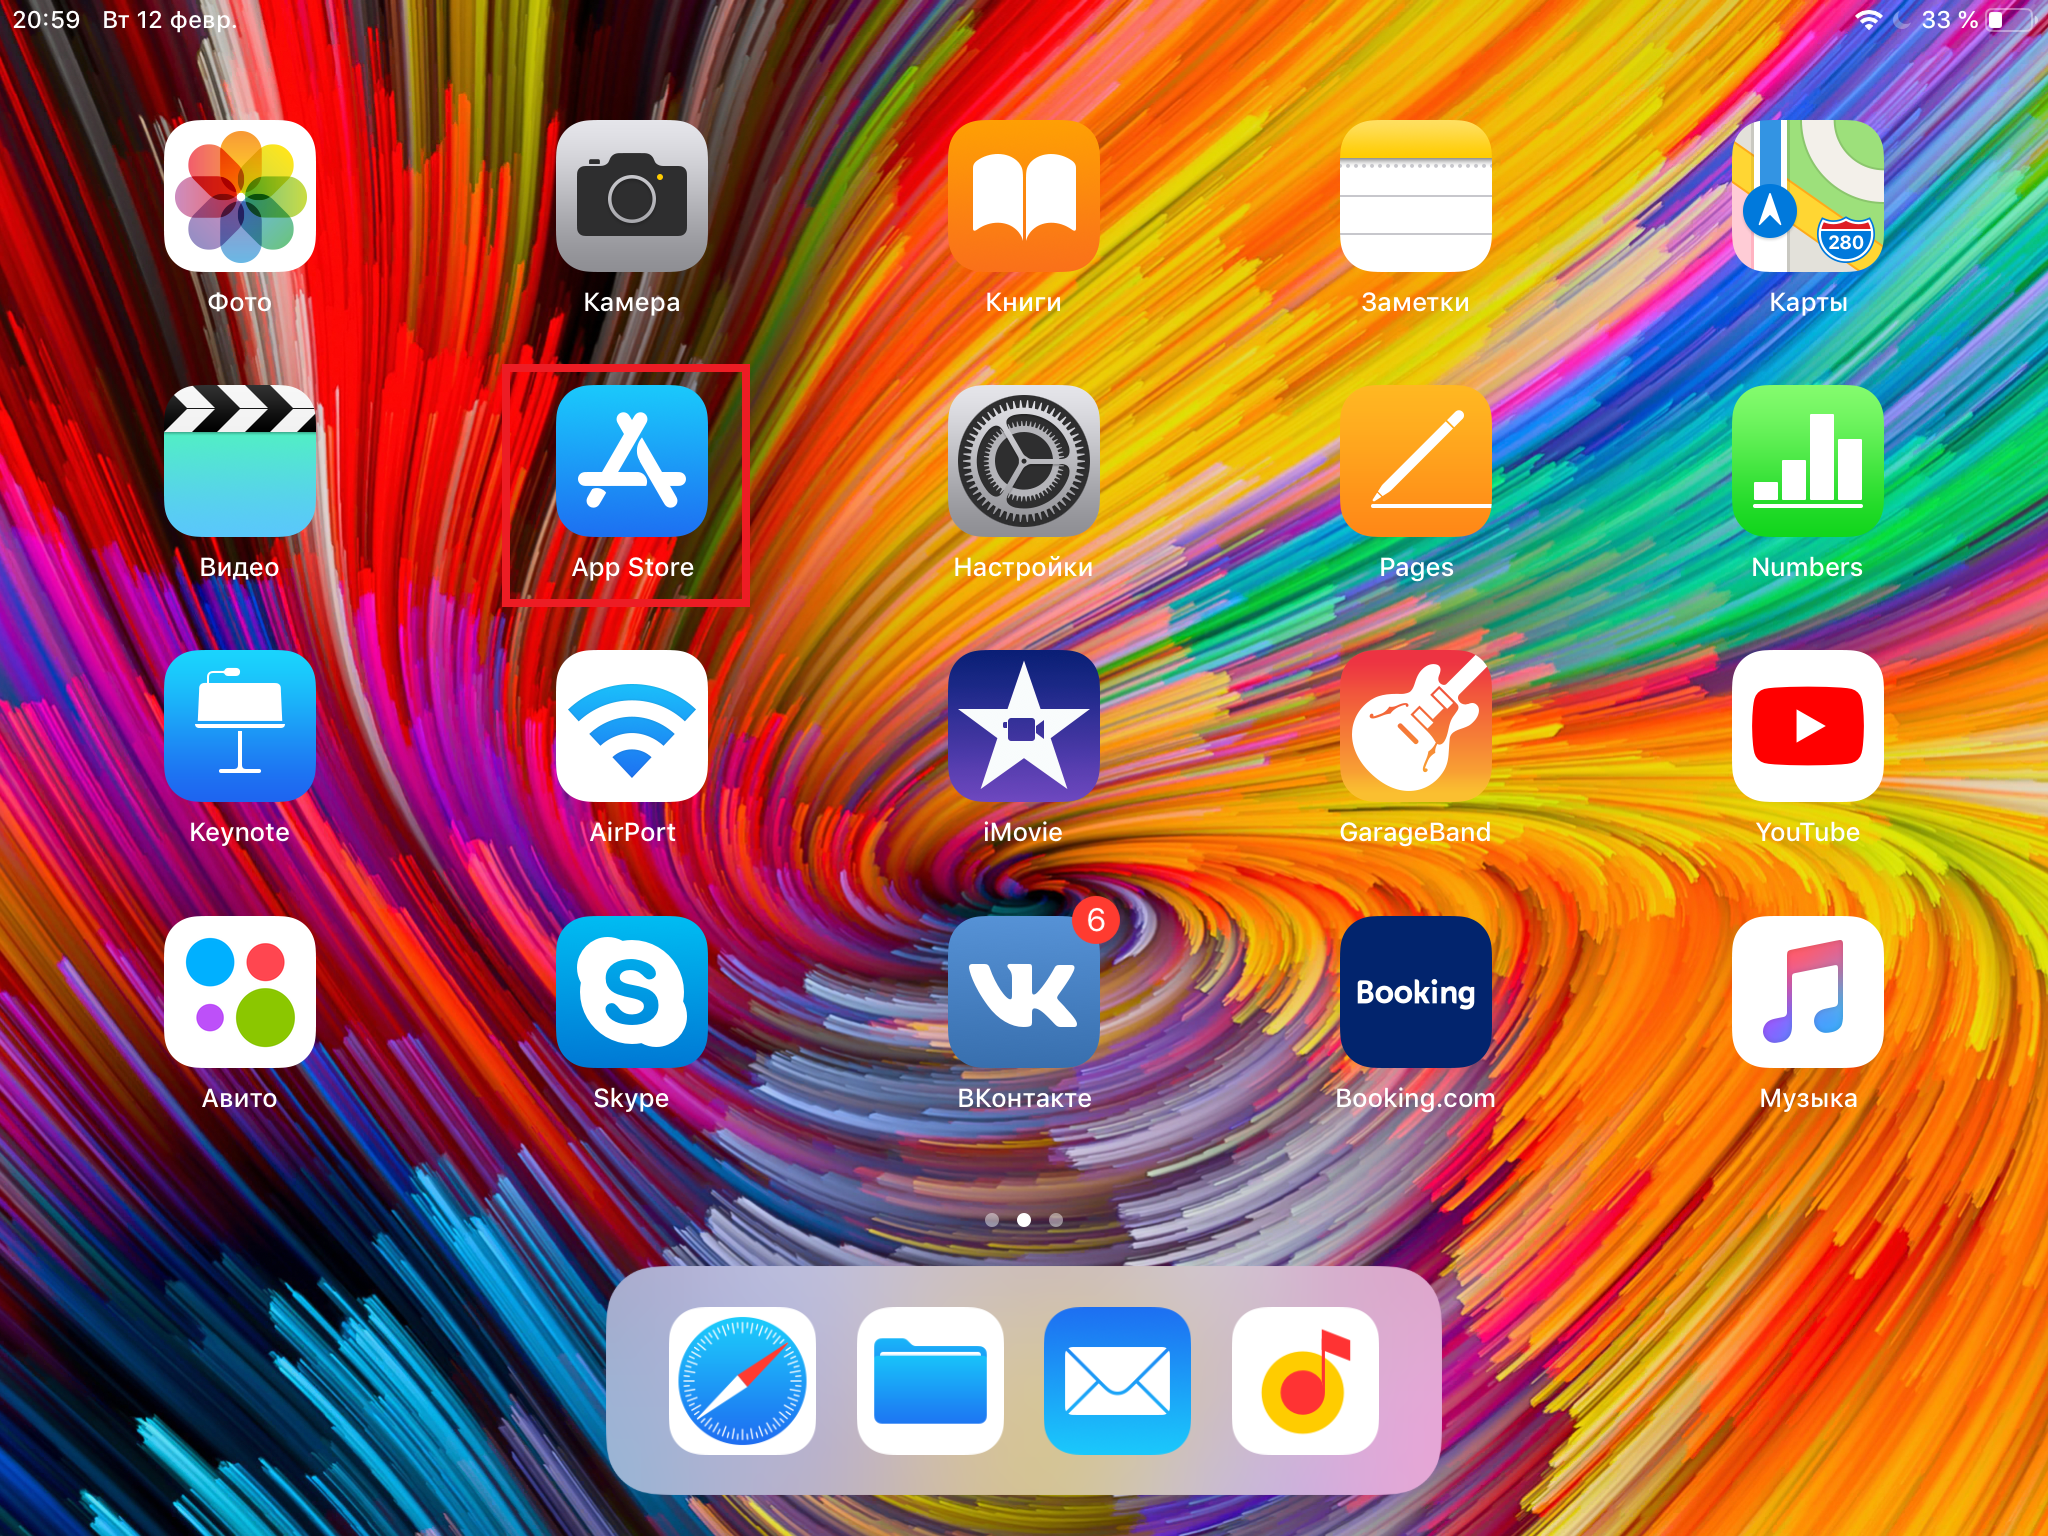 Выбираем на главном экране планшета иконку AppStore